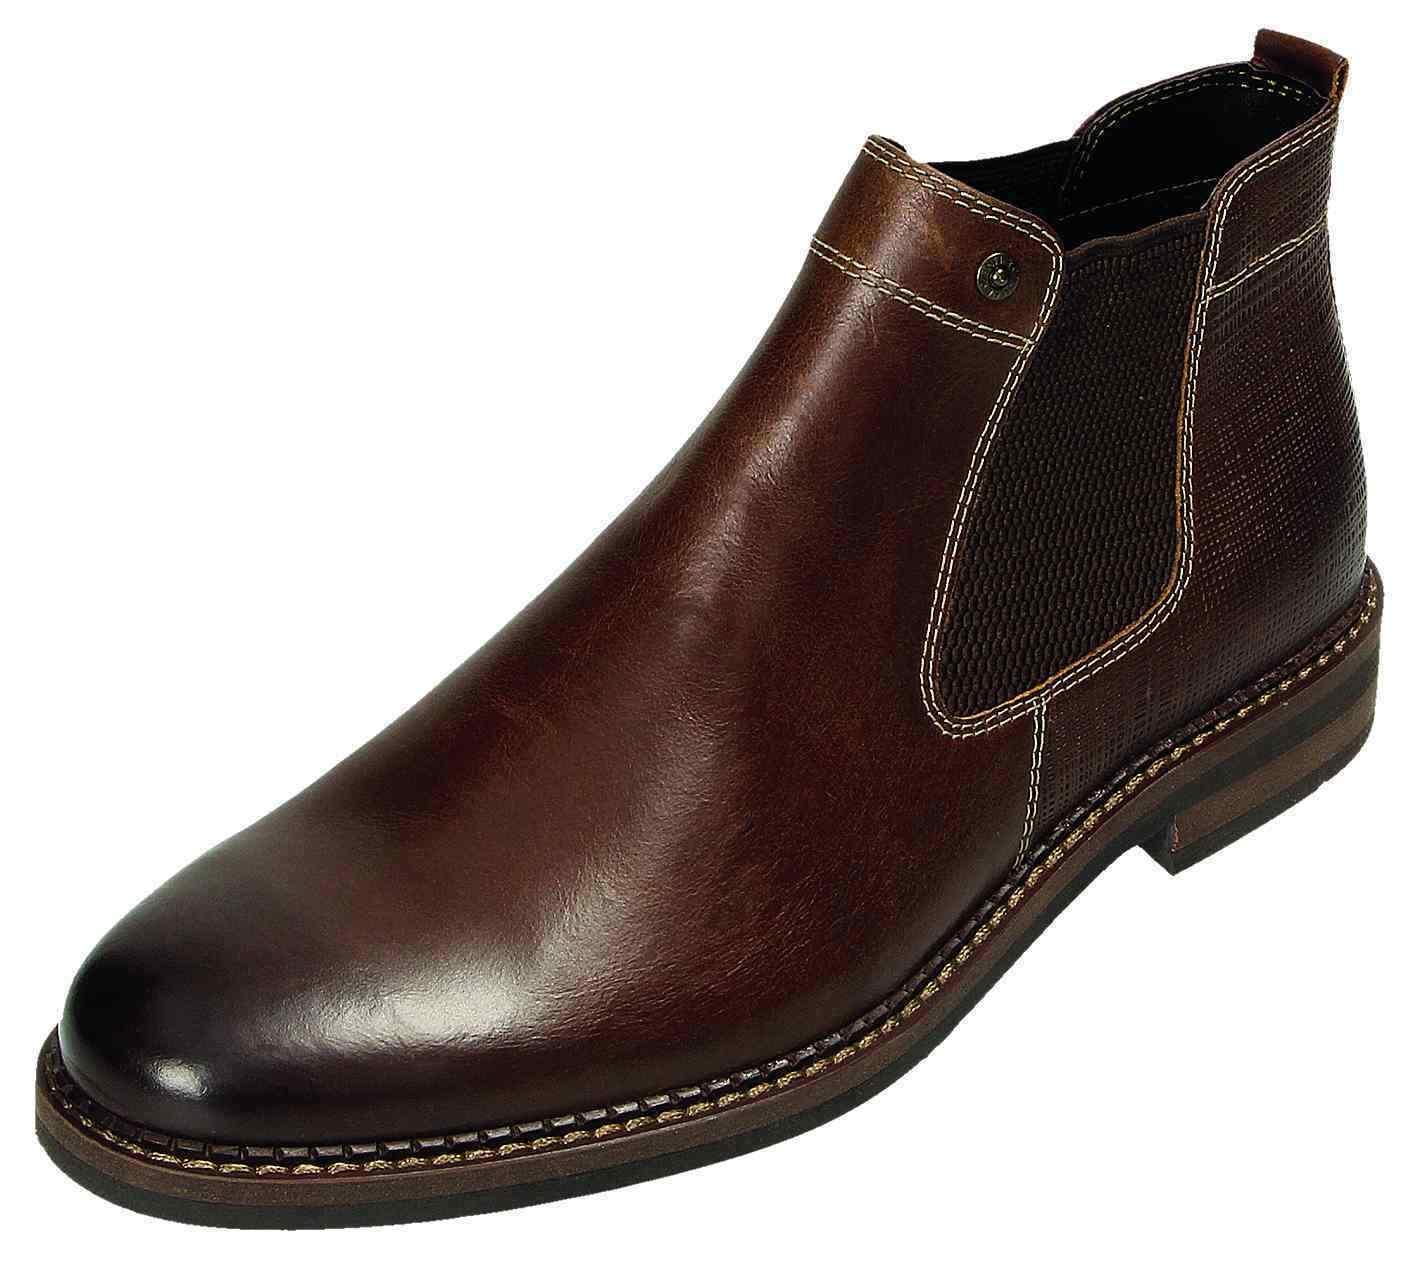 Klondike chelsea botas botines de cuero zapatos mh-236h38 marrón neu31